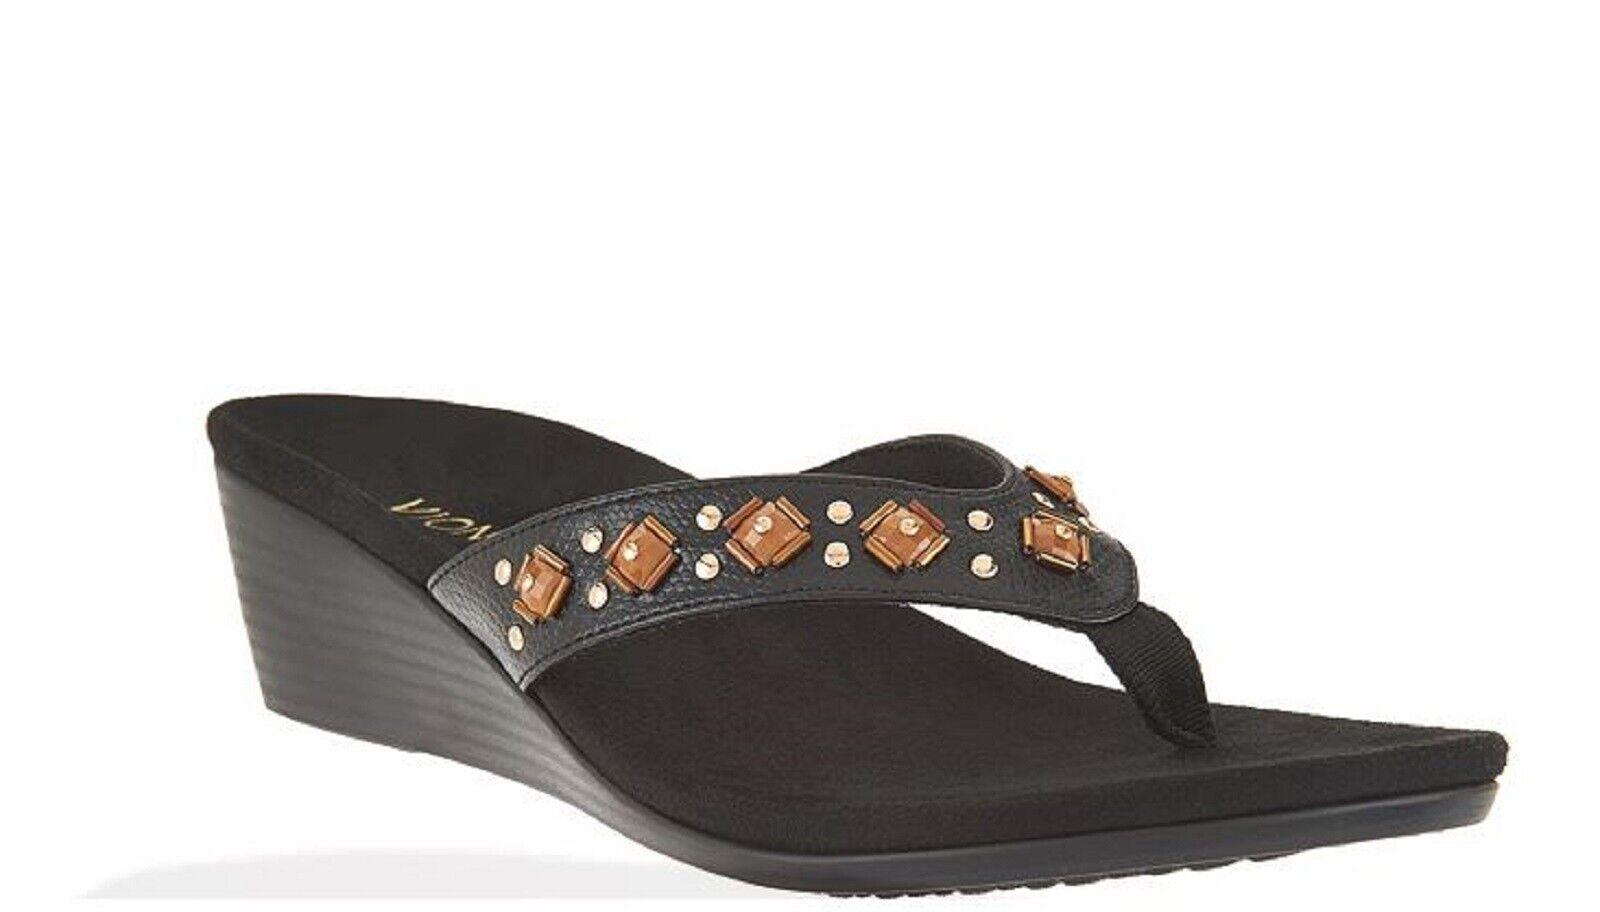 Vionic Orthaheel PARK MARCEAU Embellished Wedge Sandals BLACK Size 9.5 M NIB